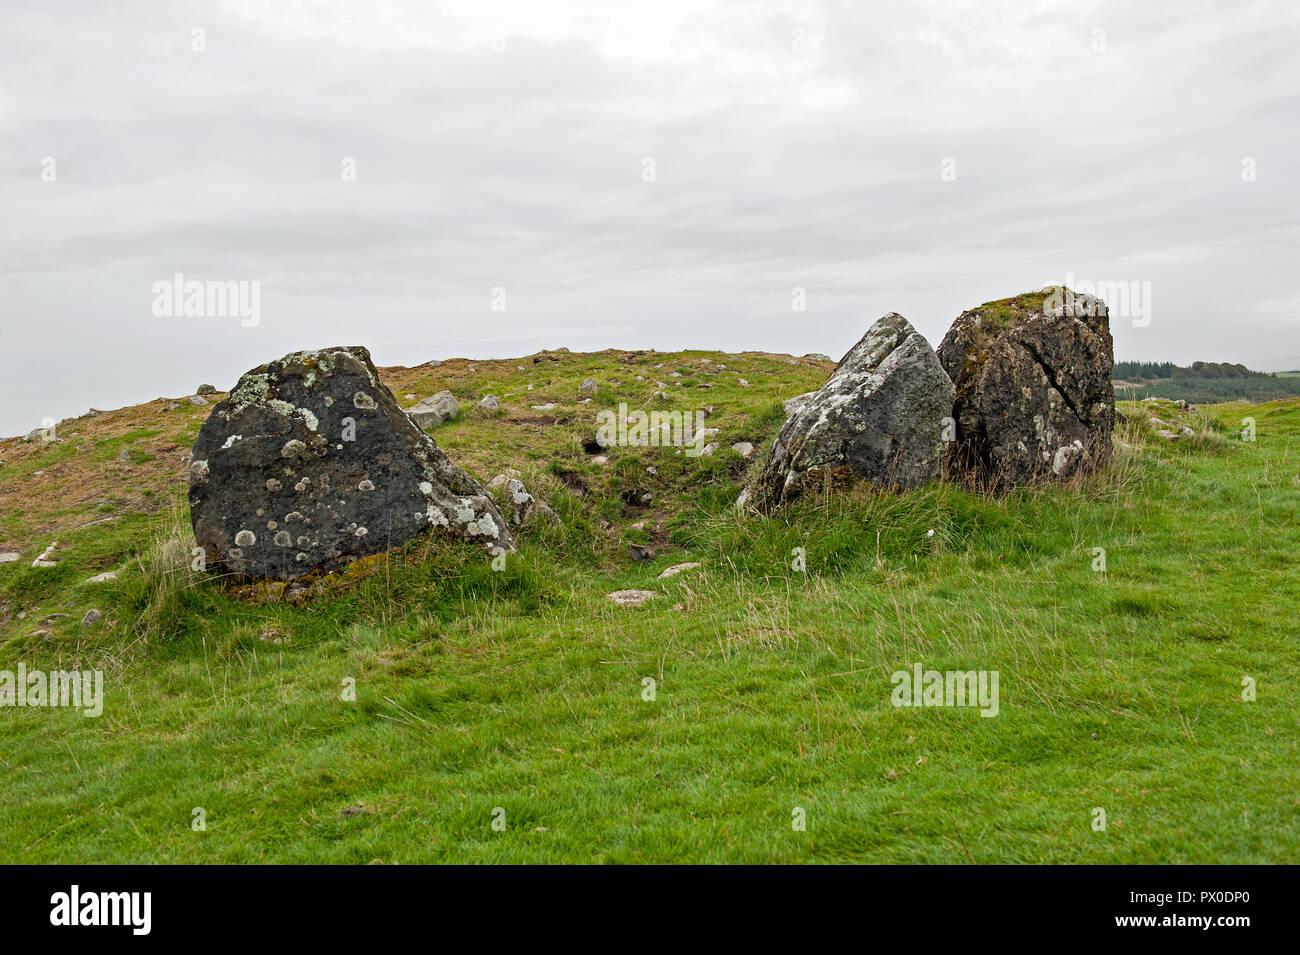 Loughcrew antiguo sepulcro megalítico, Co Meath, Irlanda Foto de stock